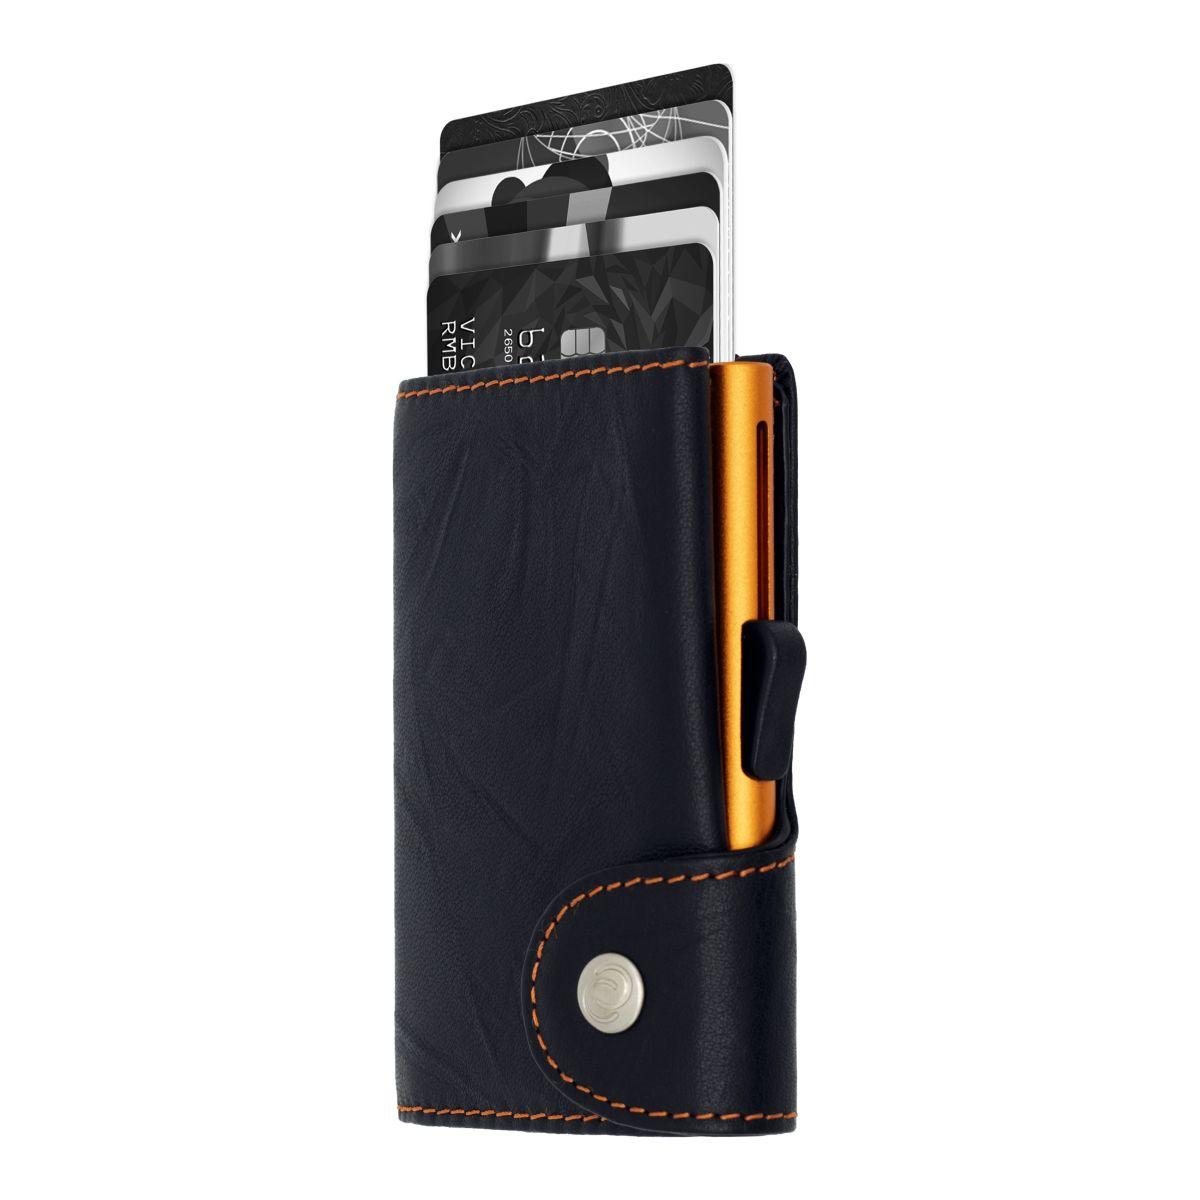 Aluminum Card Holder with Genuine Leather - Black / Orange